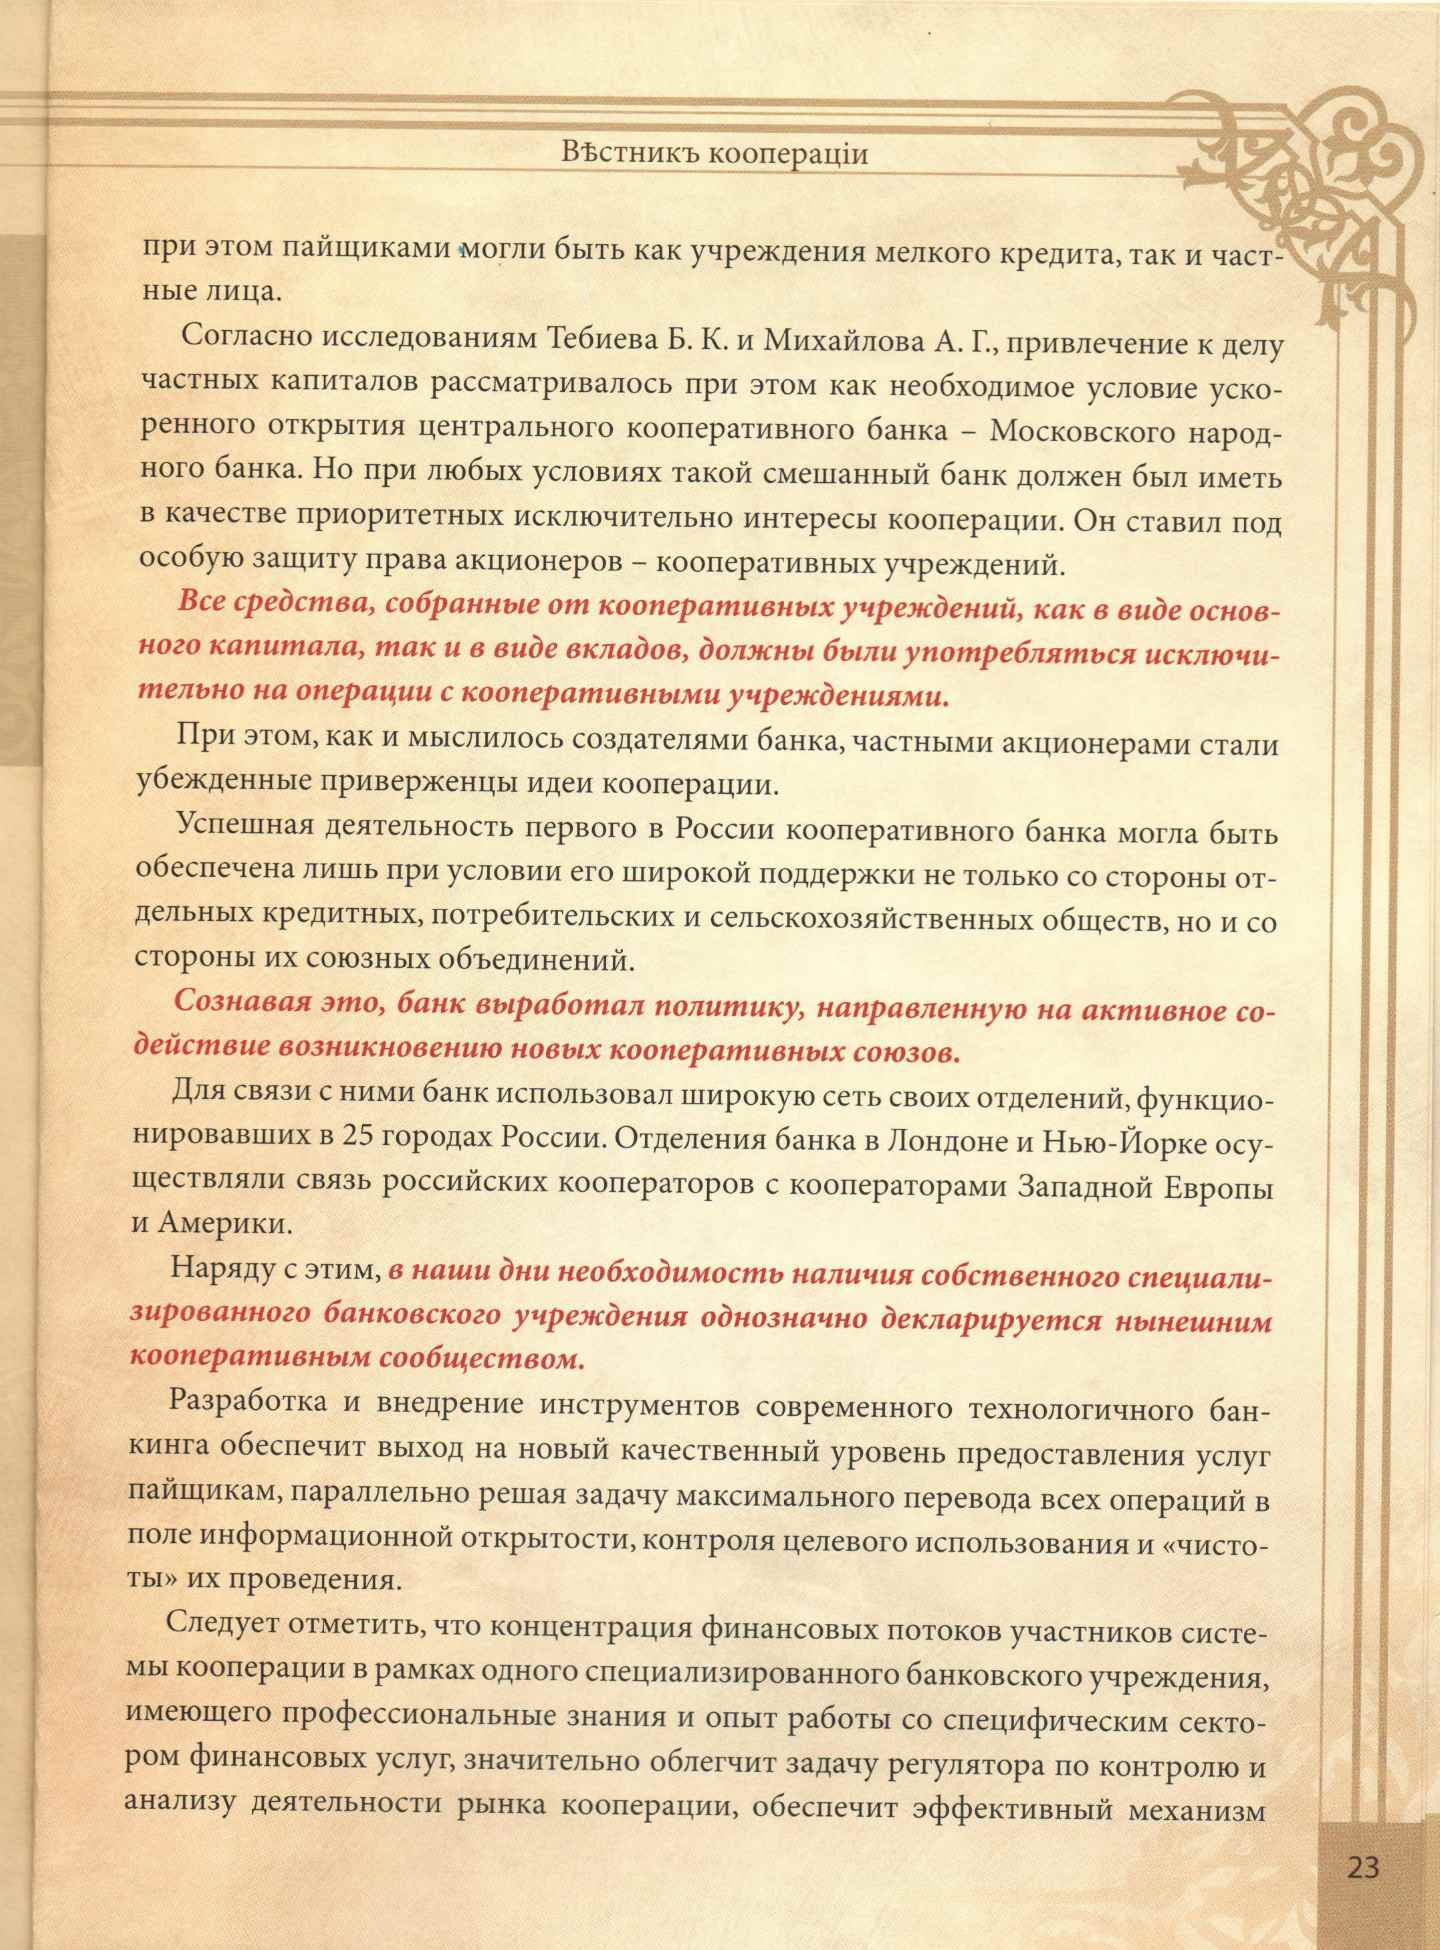 Вестник кооперации-23